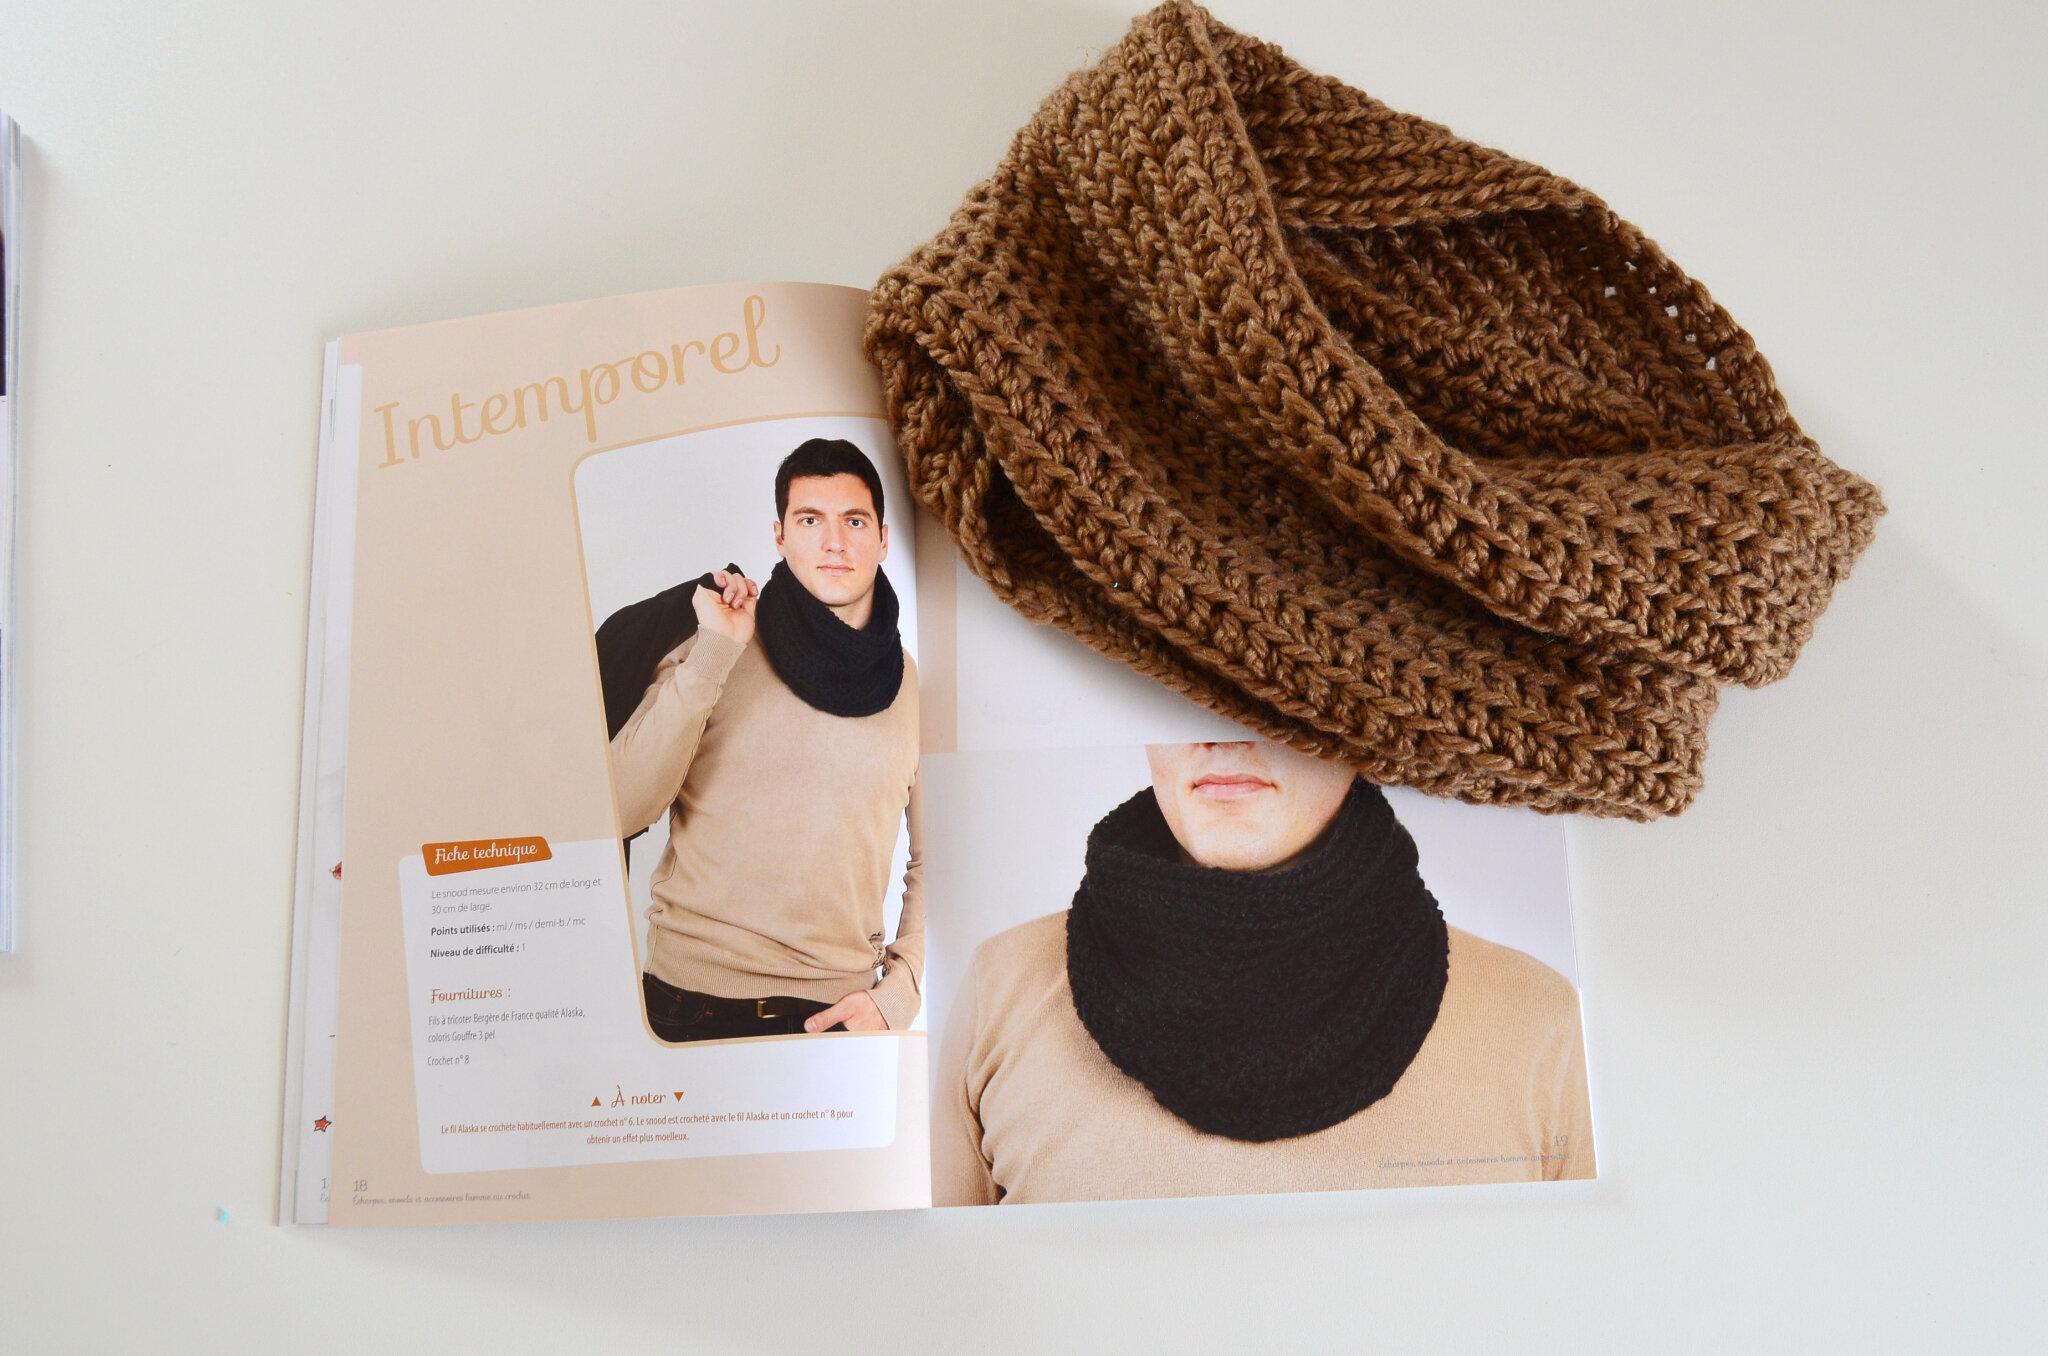 Snood-crochet-laine-creapassions-La chouette bricole (3)